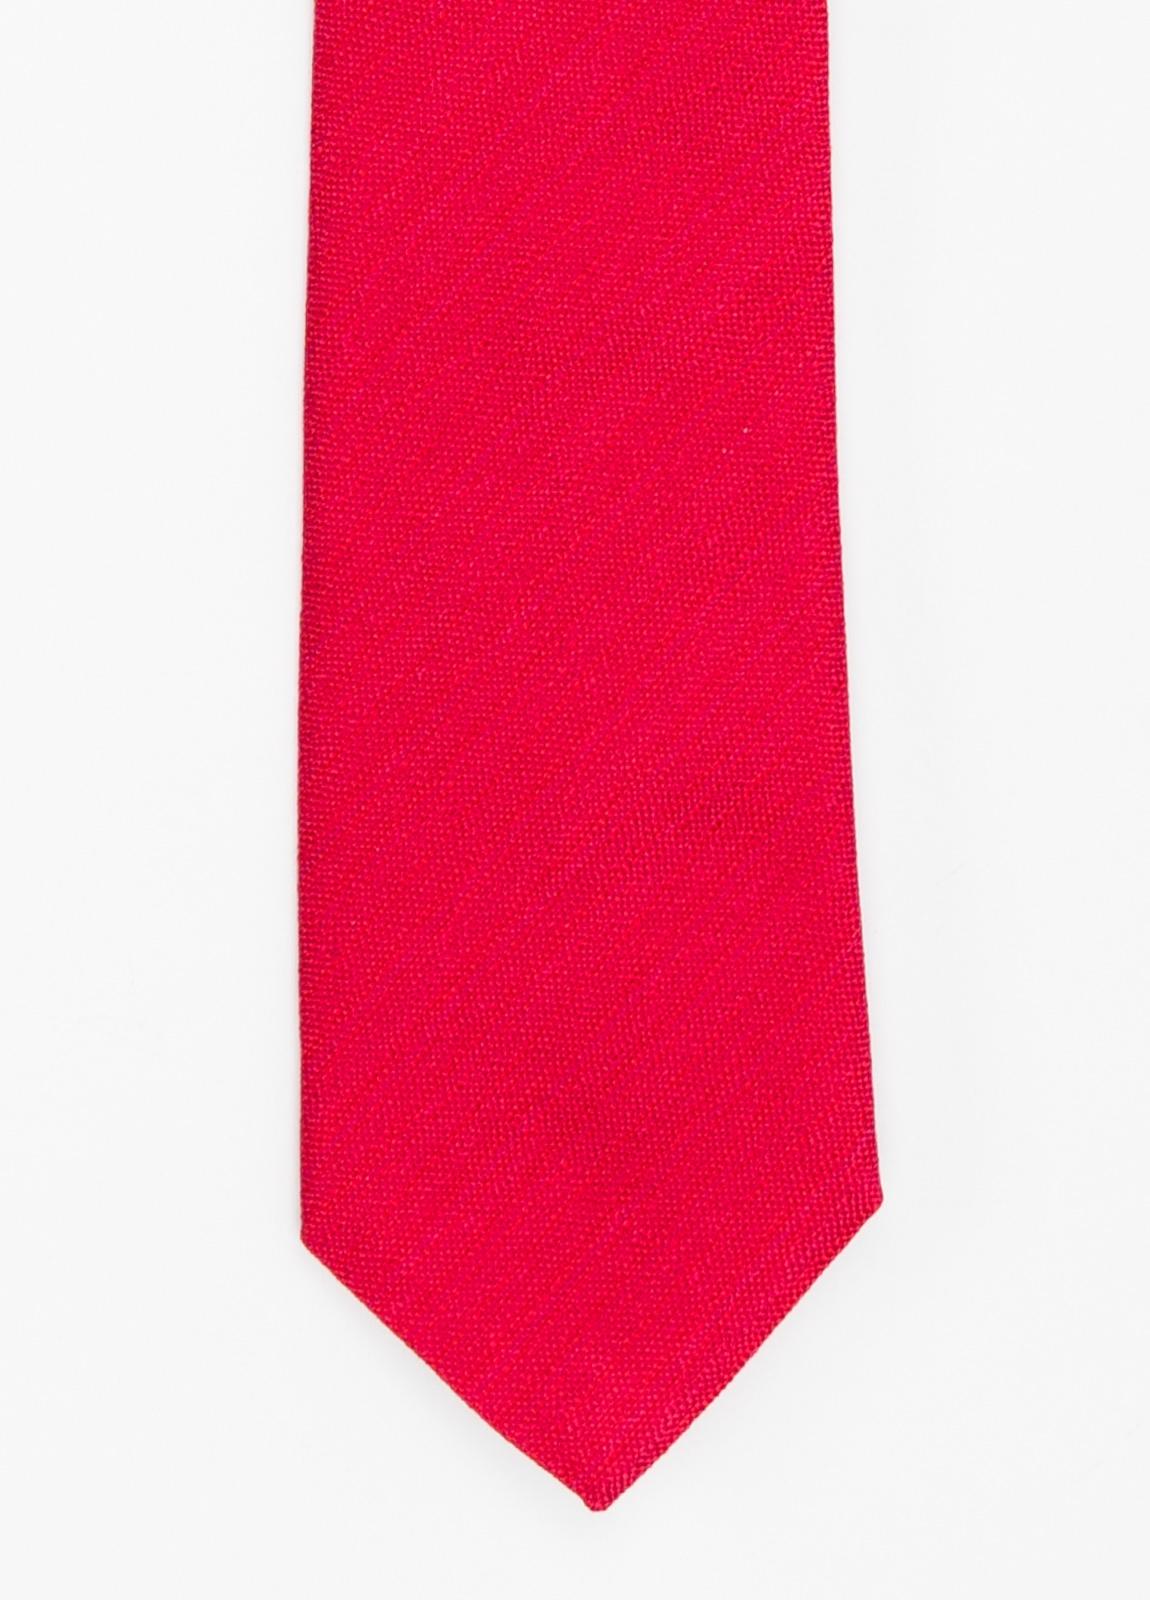 Corbata Formal Wear microtextura color rojo. Pala 7,5 cm. 96% Seda 4% Algodón.